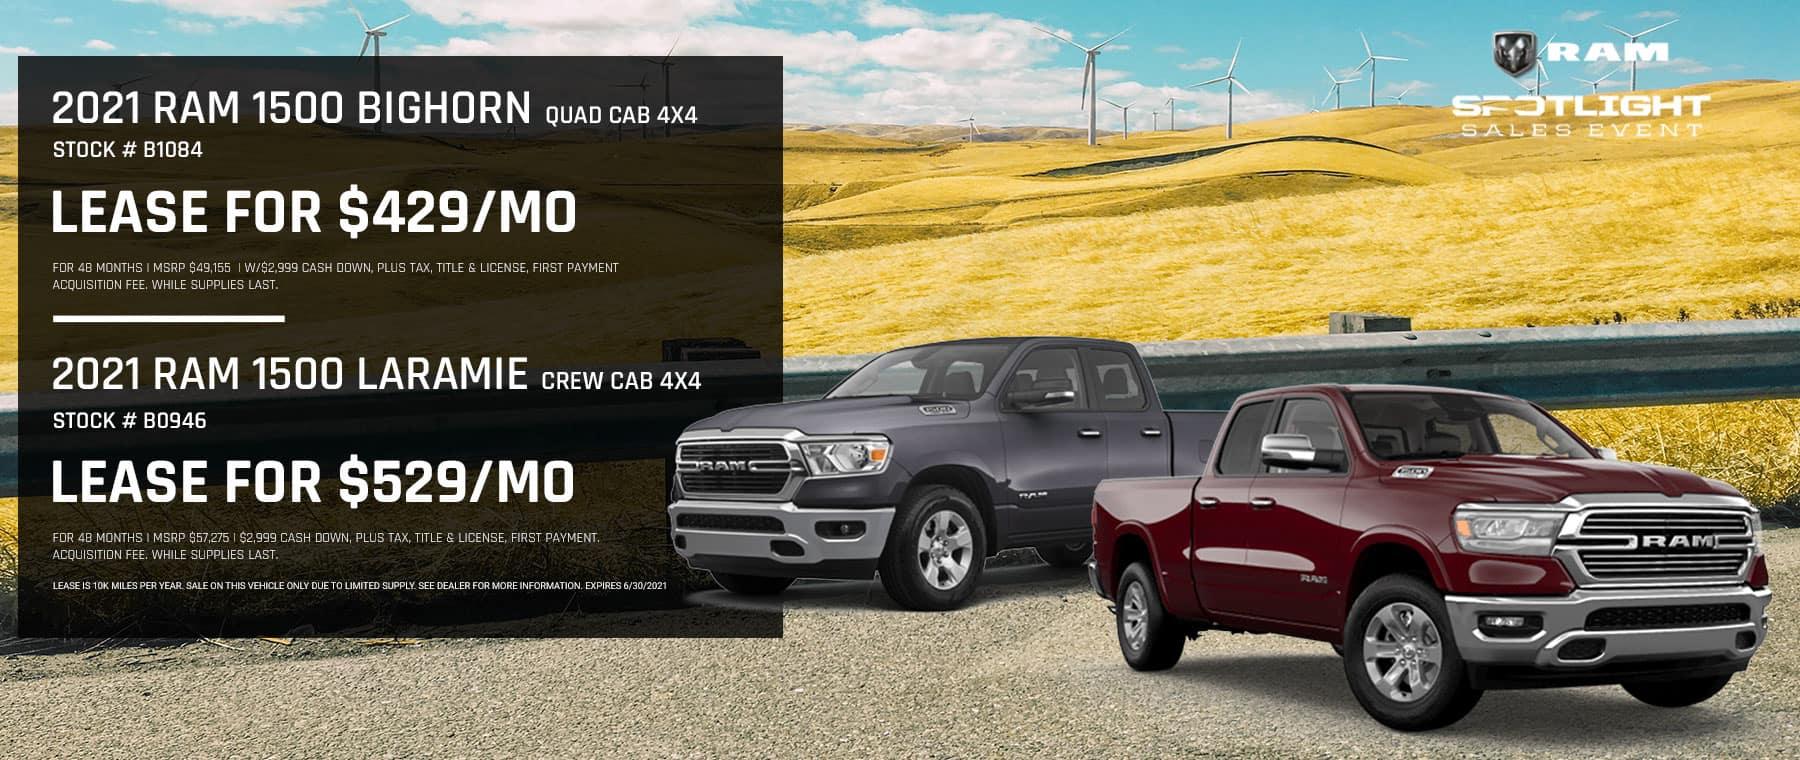 2021 RAM 1500 Bighorn Quad Cab 4x4 Stock # B1084 | 2021 RAM 1500 Laramie Crew Cab 4x4 Stock # B0946